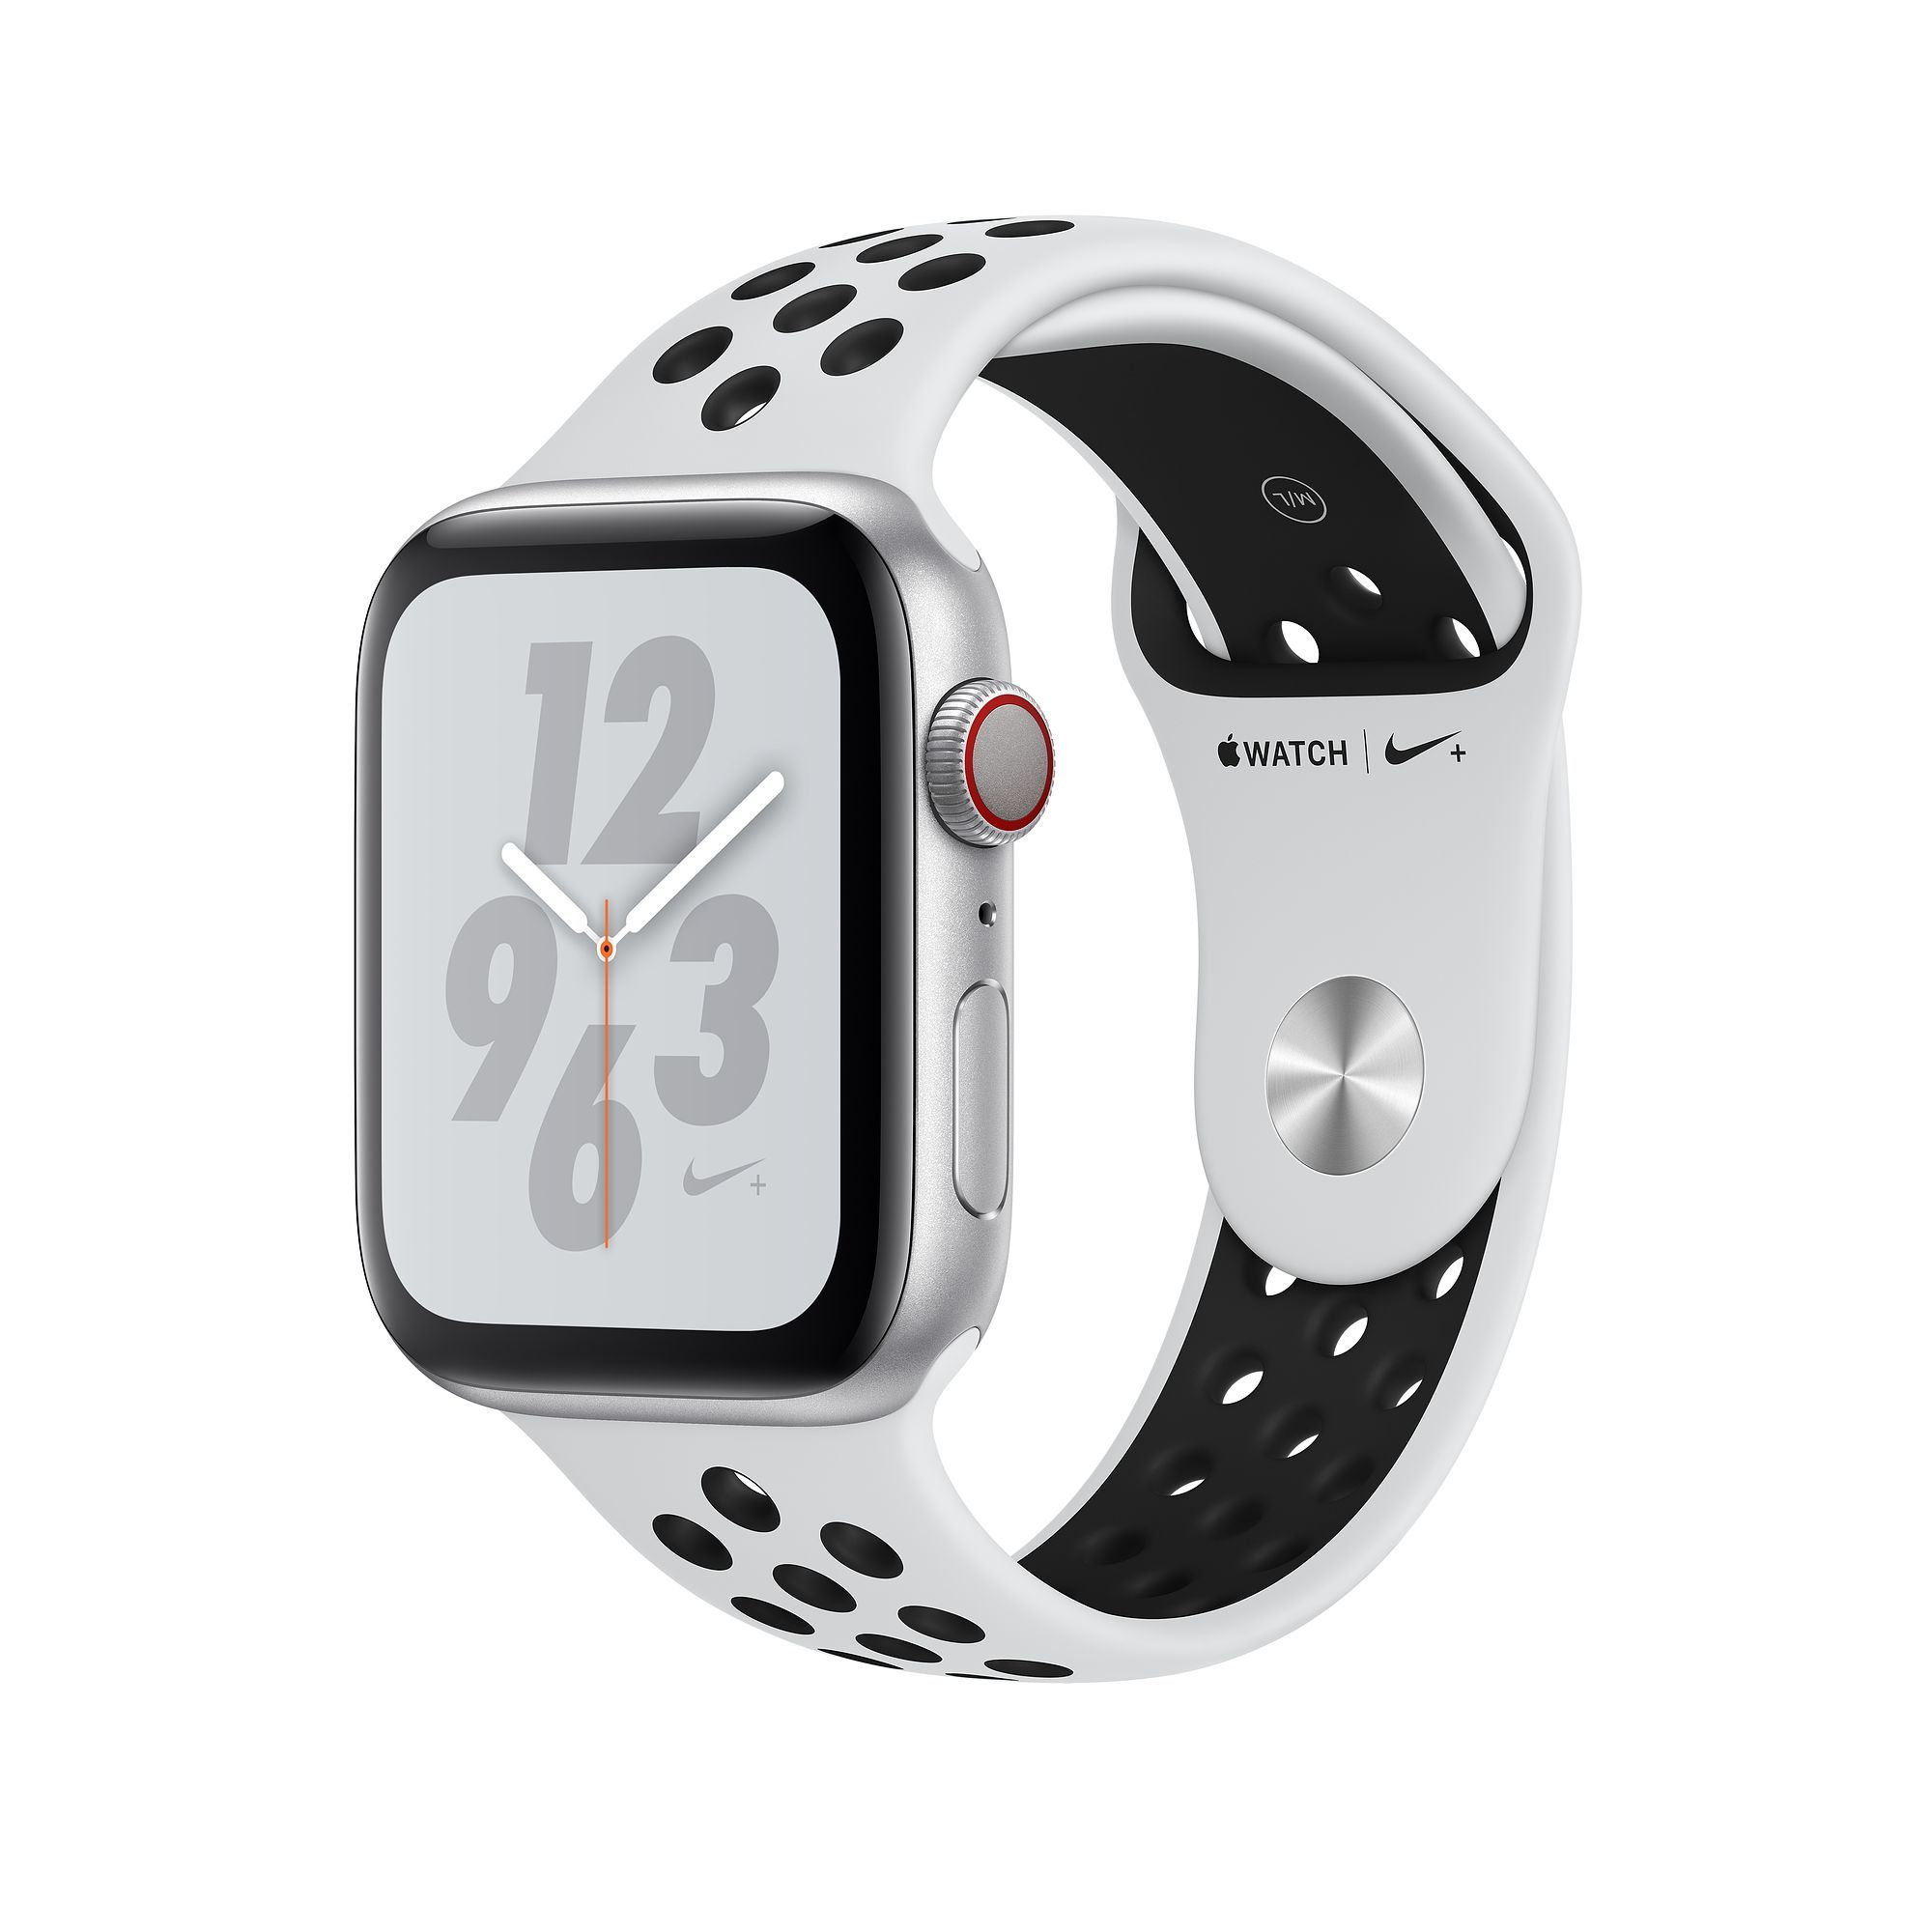 Buy Apple Watch Series 5 Buy apple watch, Apple watch